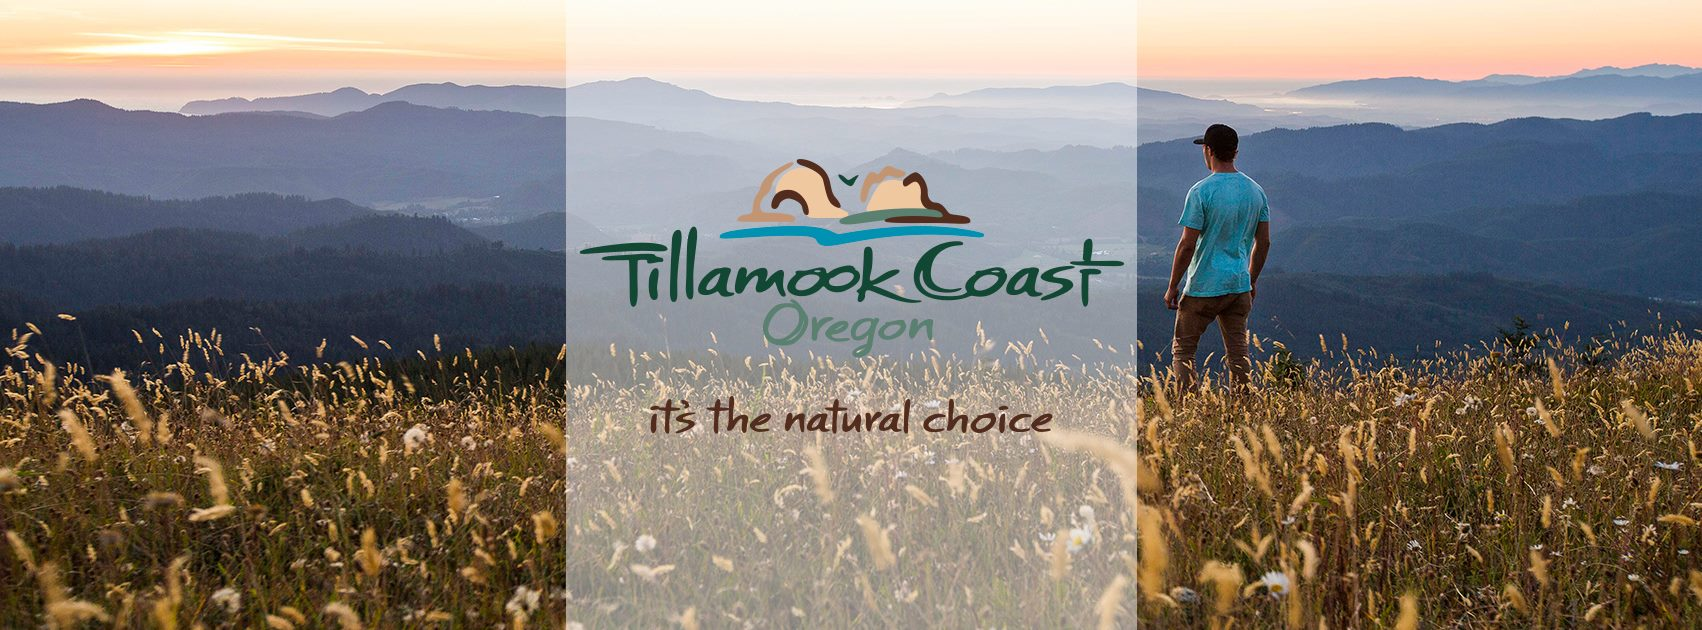 Visit Tillamook Coast.jpg